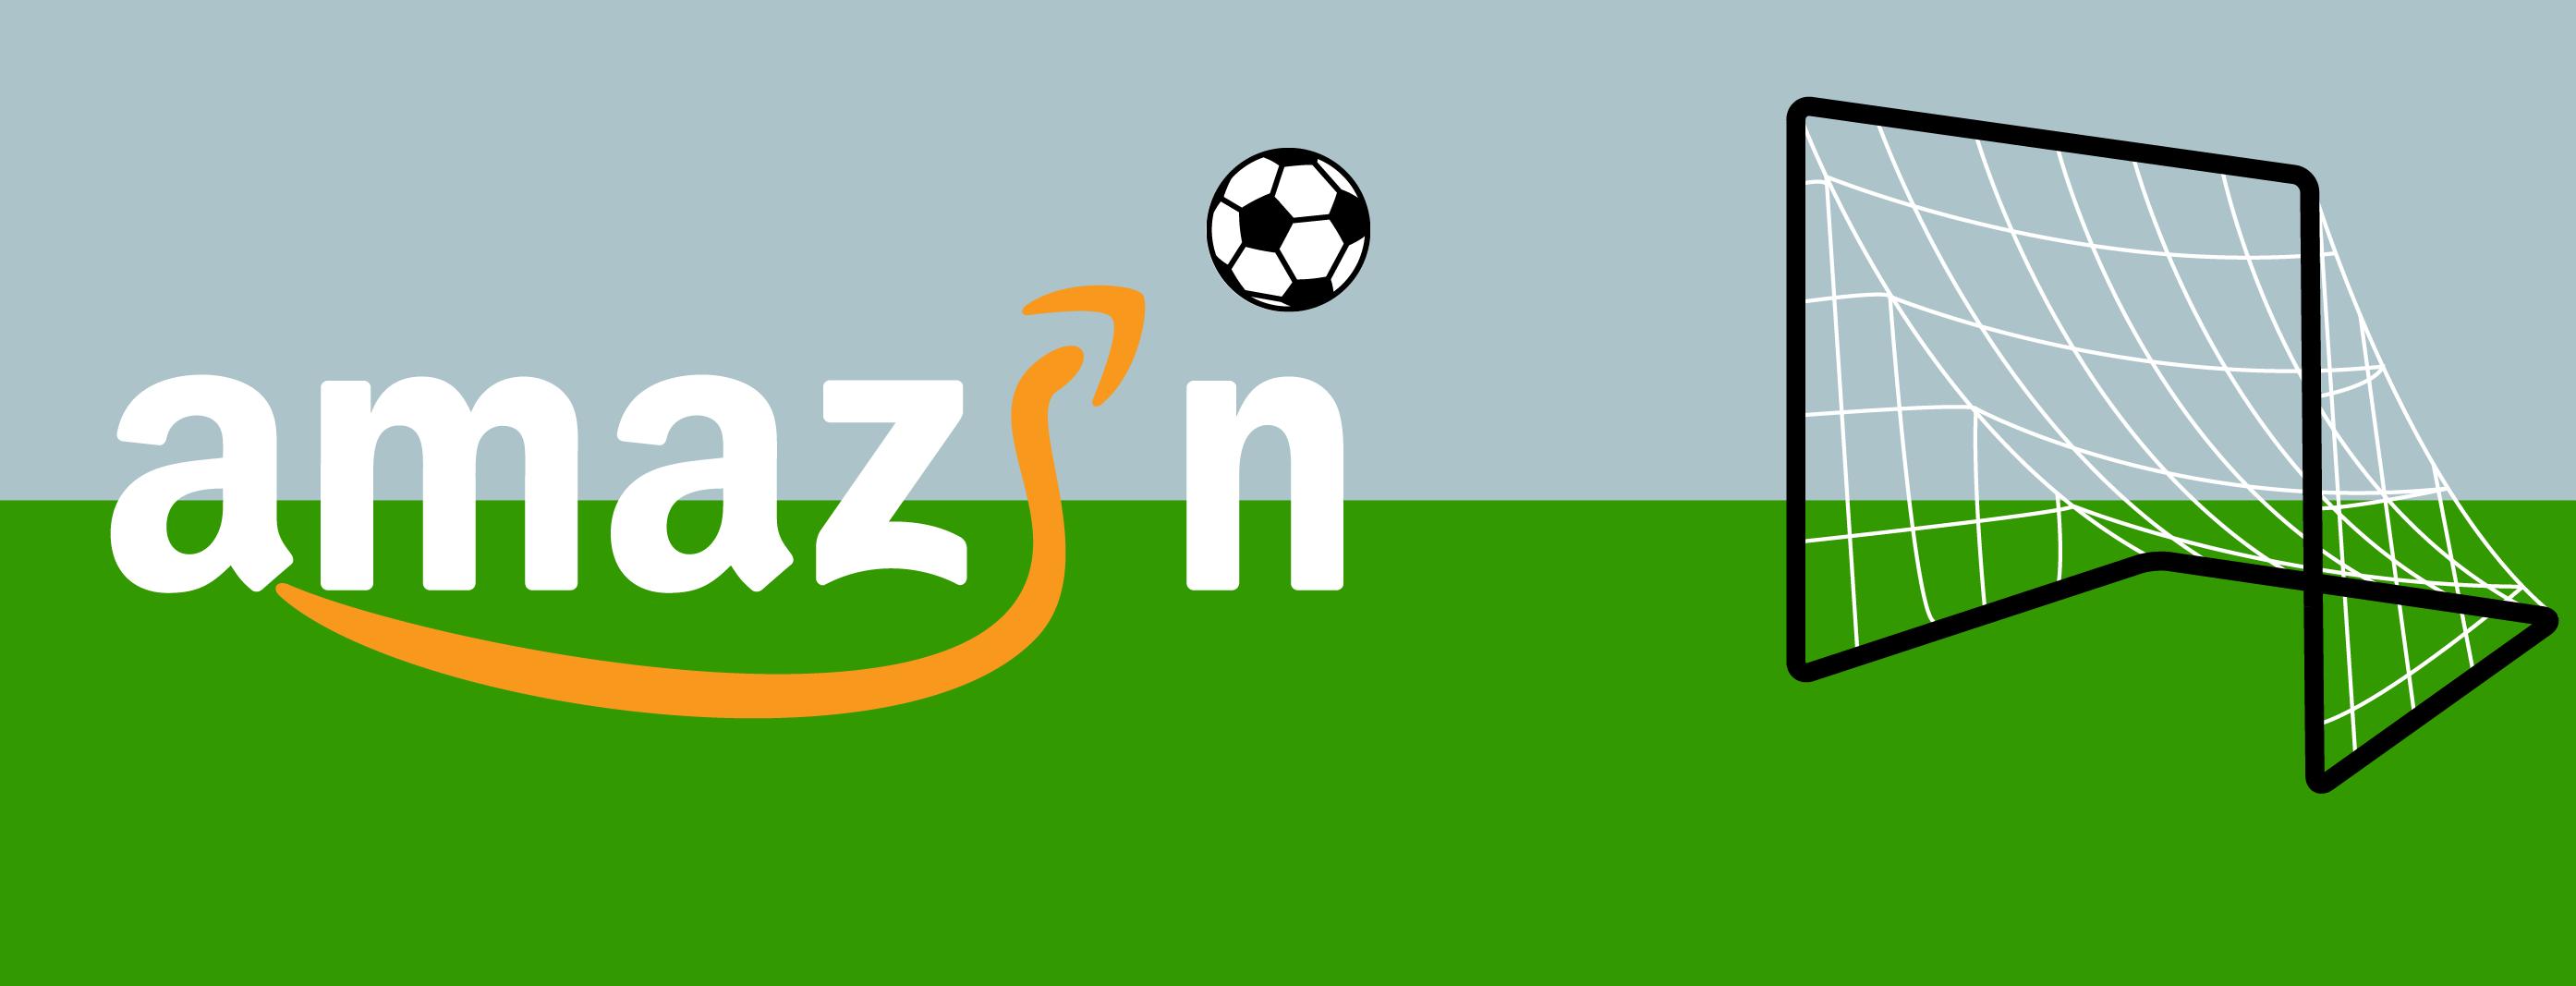 Entrada da Amazon no Brasil: virada de jogo ou player superestimado?